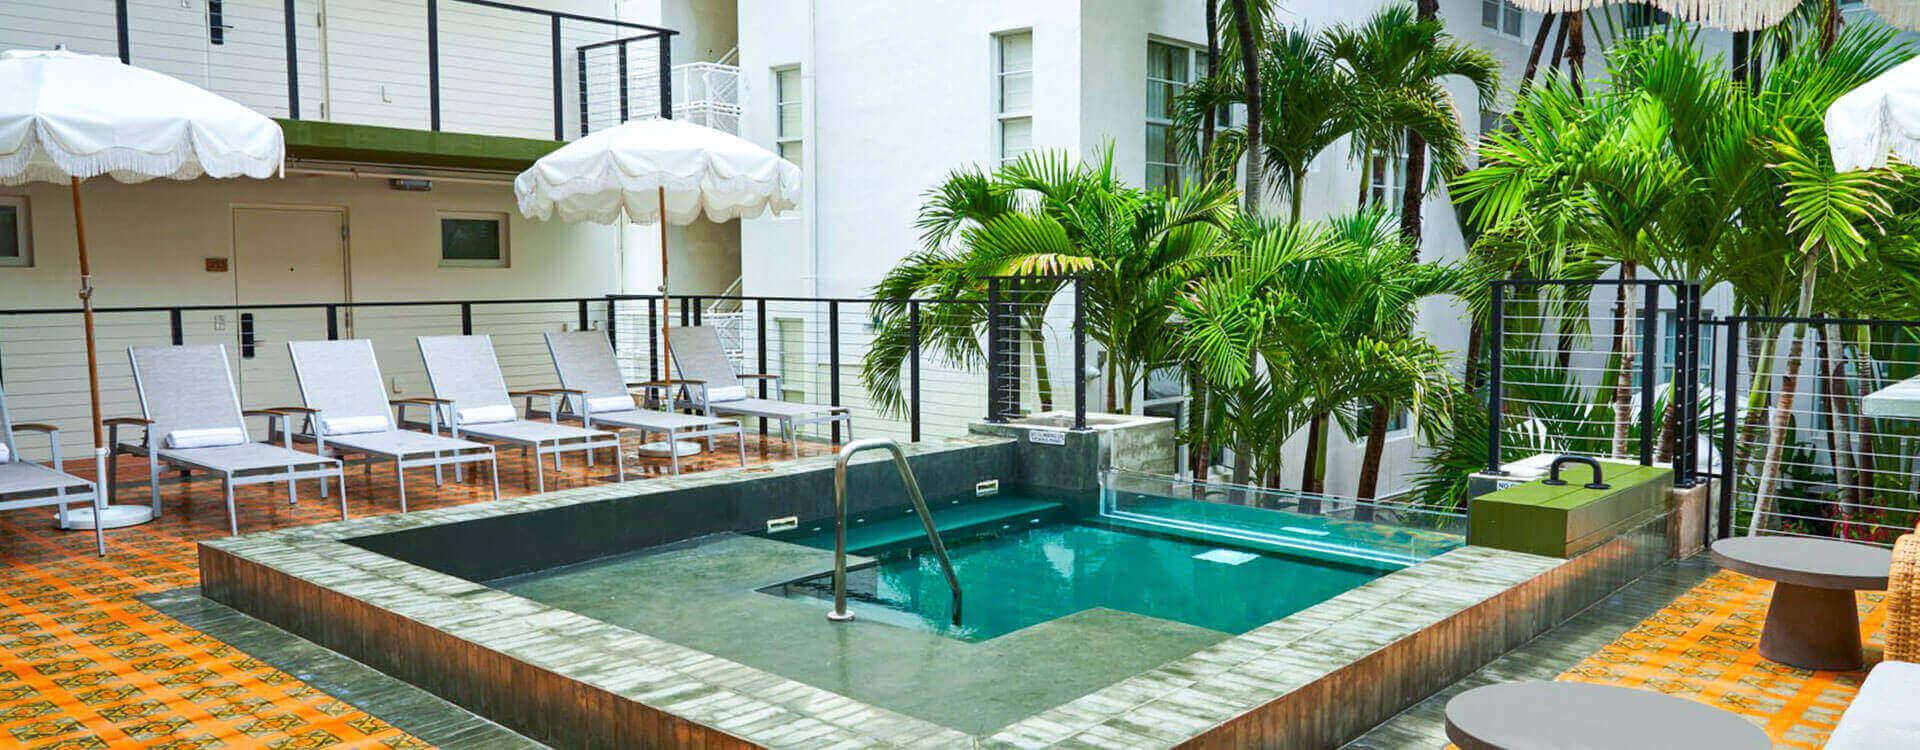 Pool View at The Balfour, Miami Beach